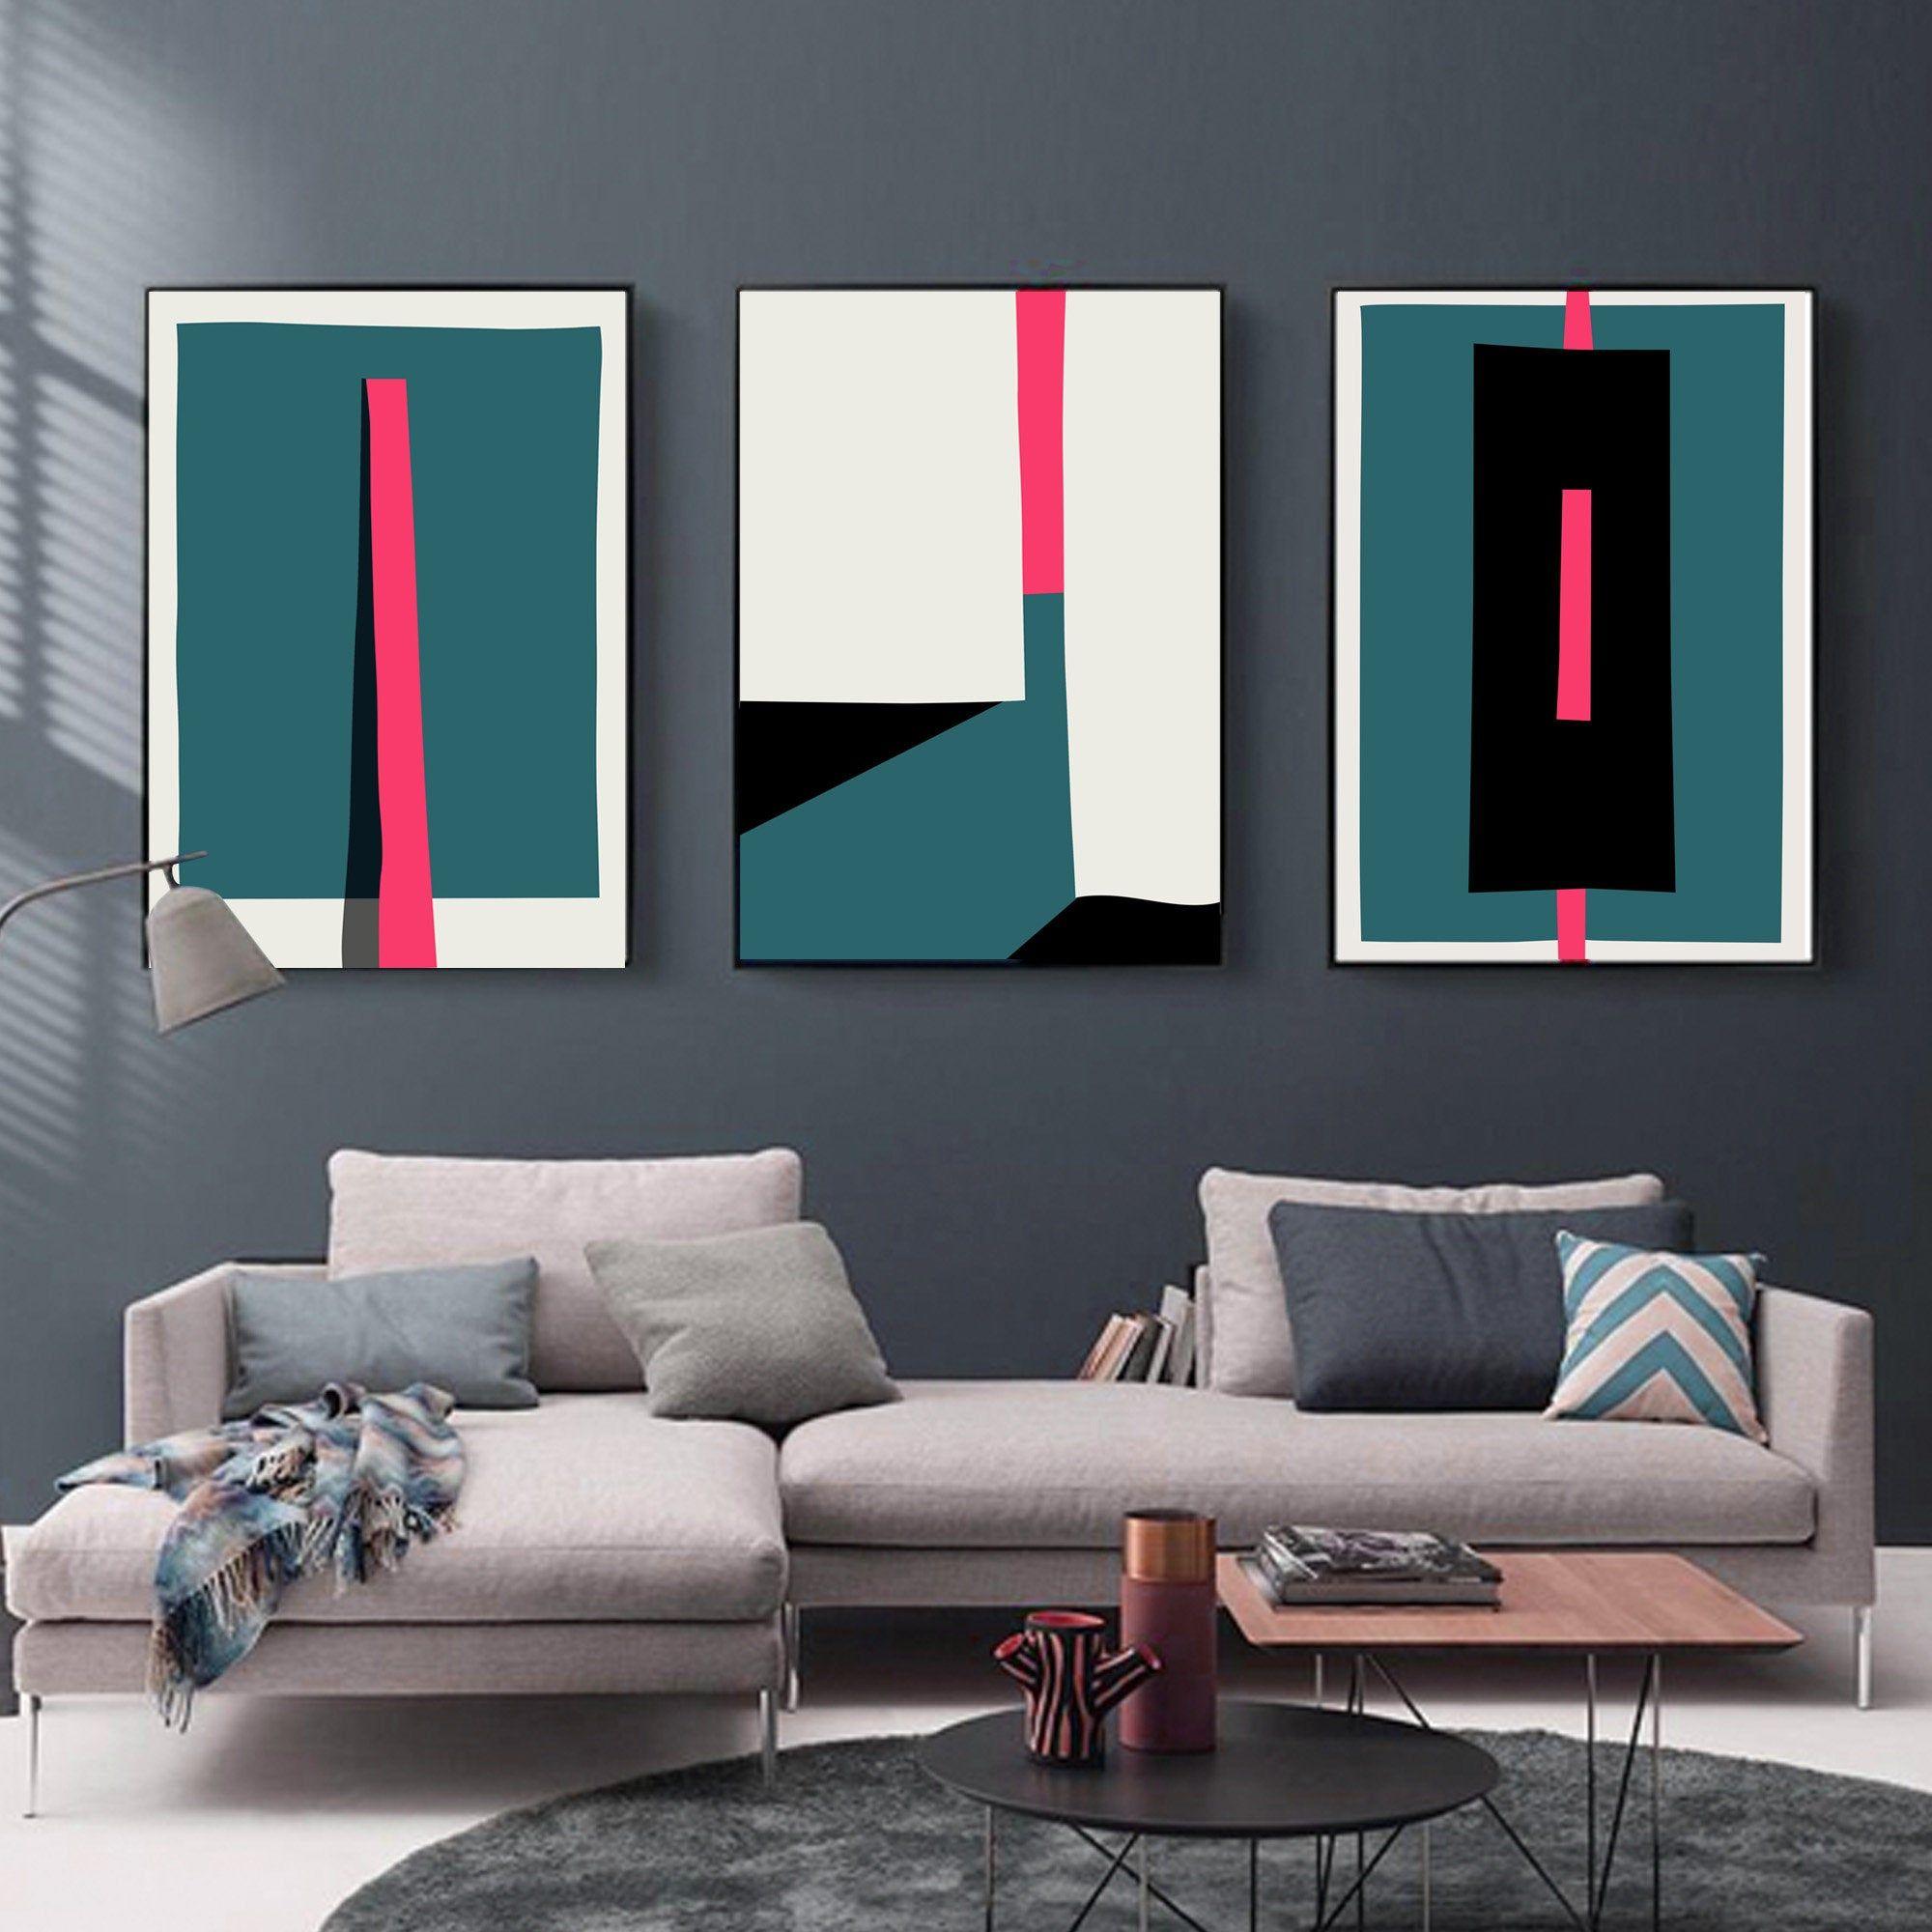 Geometric Wall Decor Neon Pink Abstract Color Block Wall Art Digital Download Prints For Housewarmin Contemporary Art Canvas Living Room Art Modern Art Decor